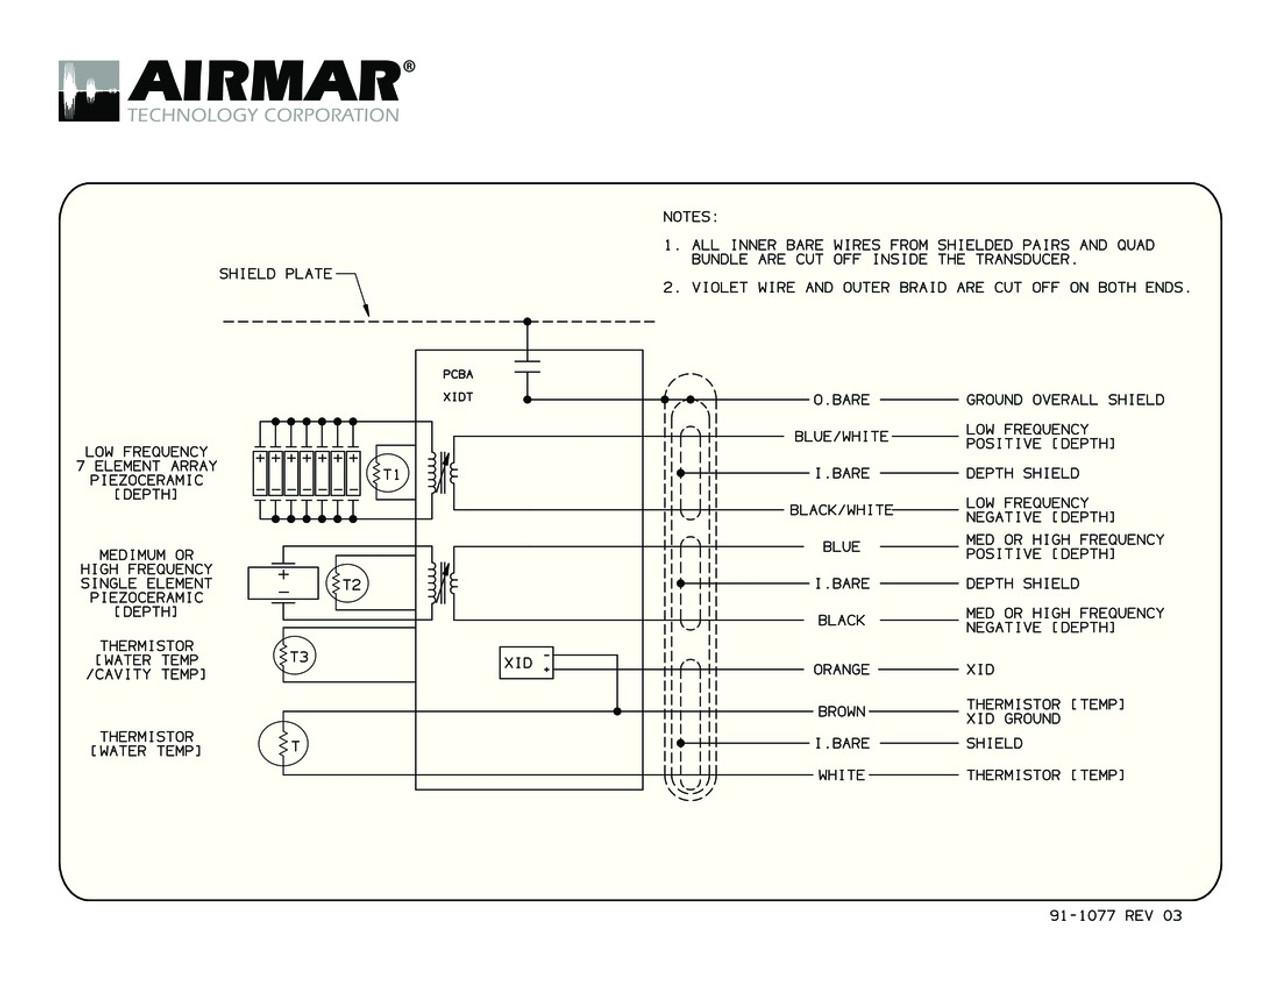 small resolution of airmar wiring diagram cm265 cm275 blue bottle marine airmar transducer s63 ls airmar transducer wiring diagram